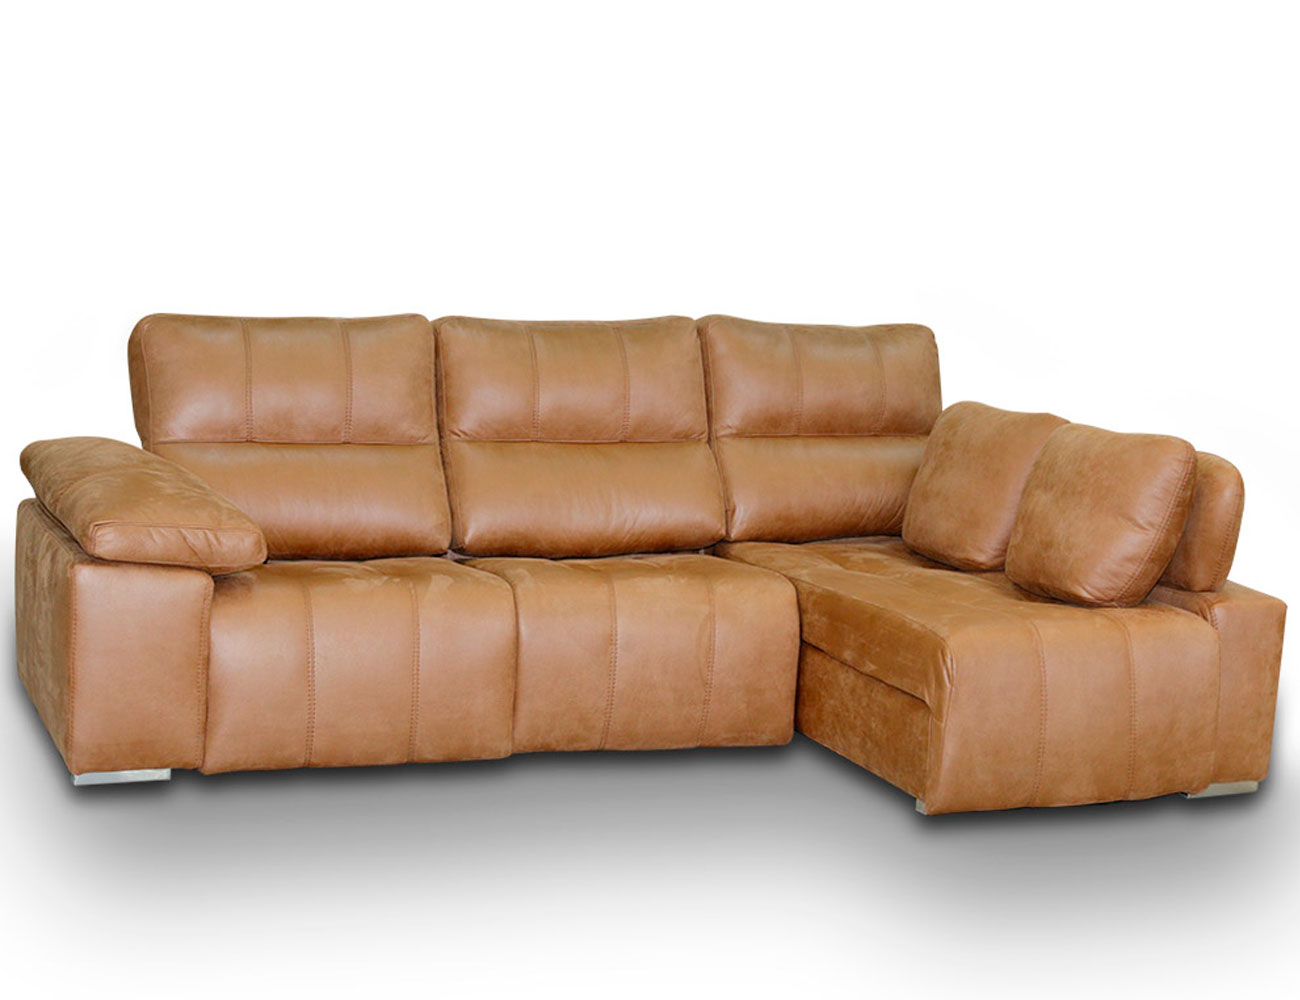 Sofa chaiselongue relax 2 motores anti manchas38